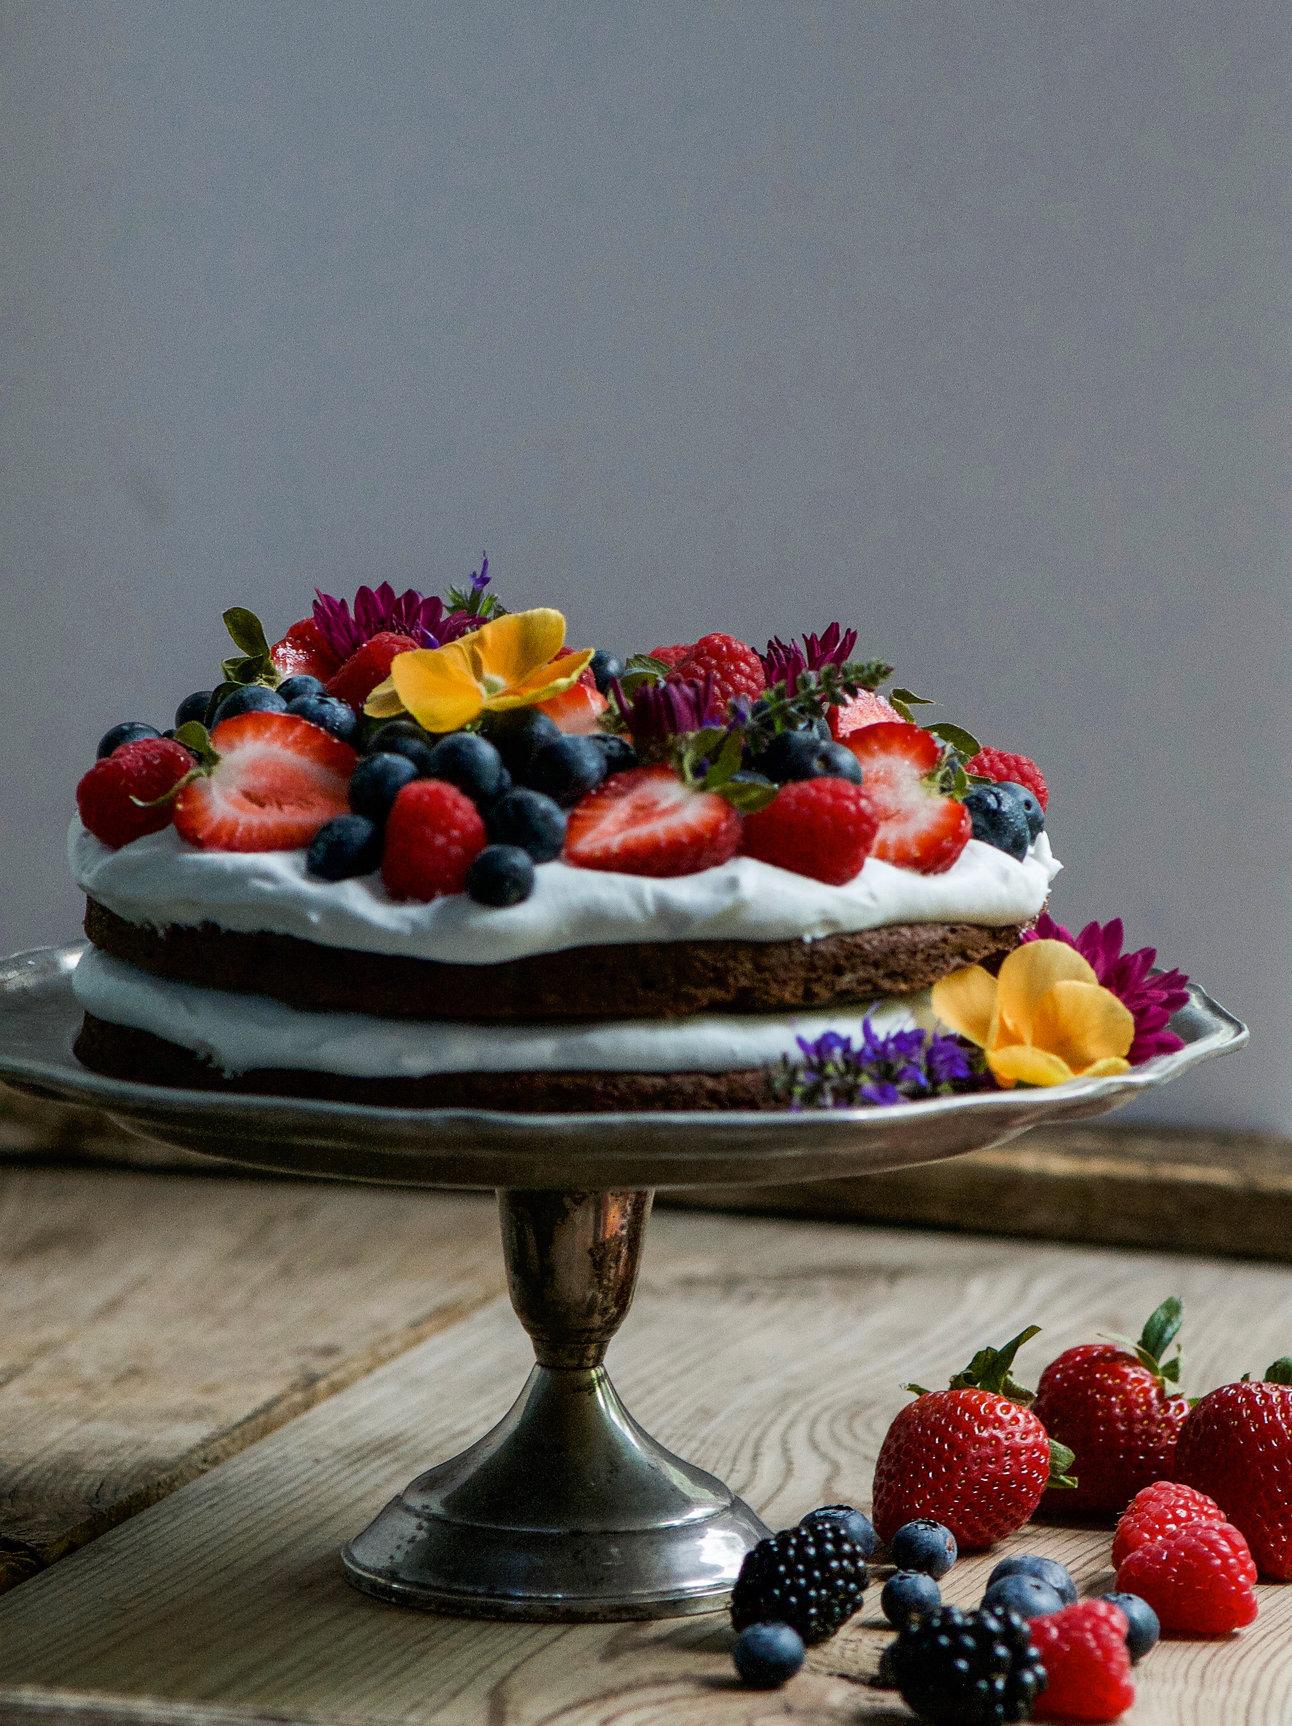 Healthy Clean Chocolate Cake Dessert